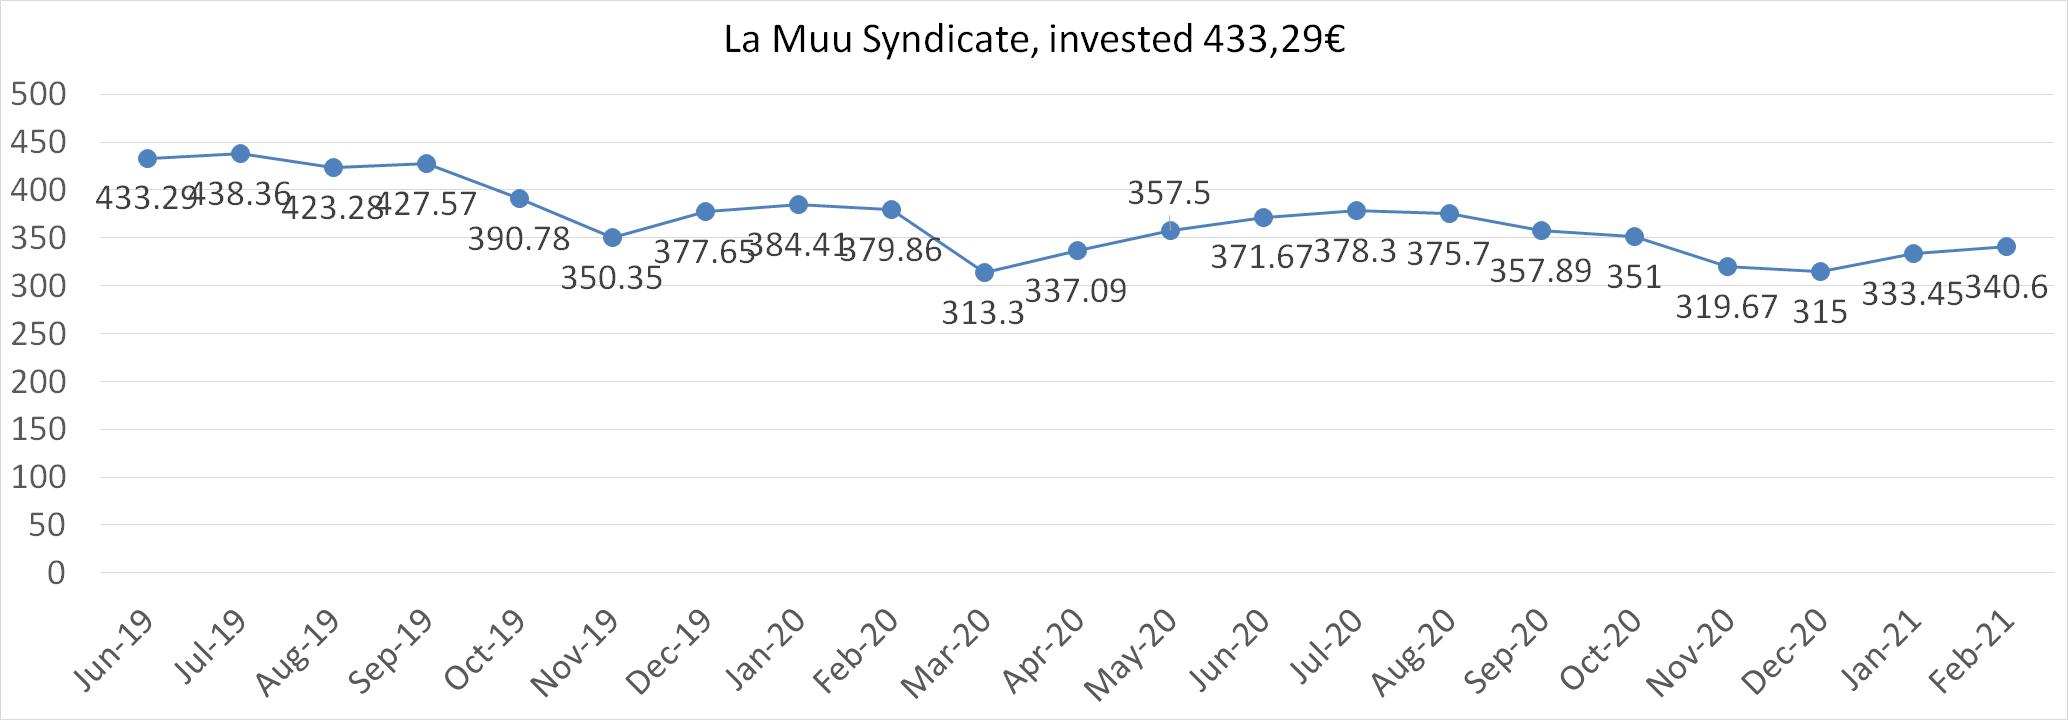 La Muu Syndicate worth february 2021